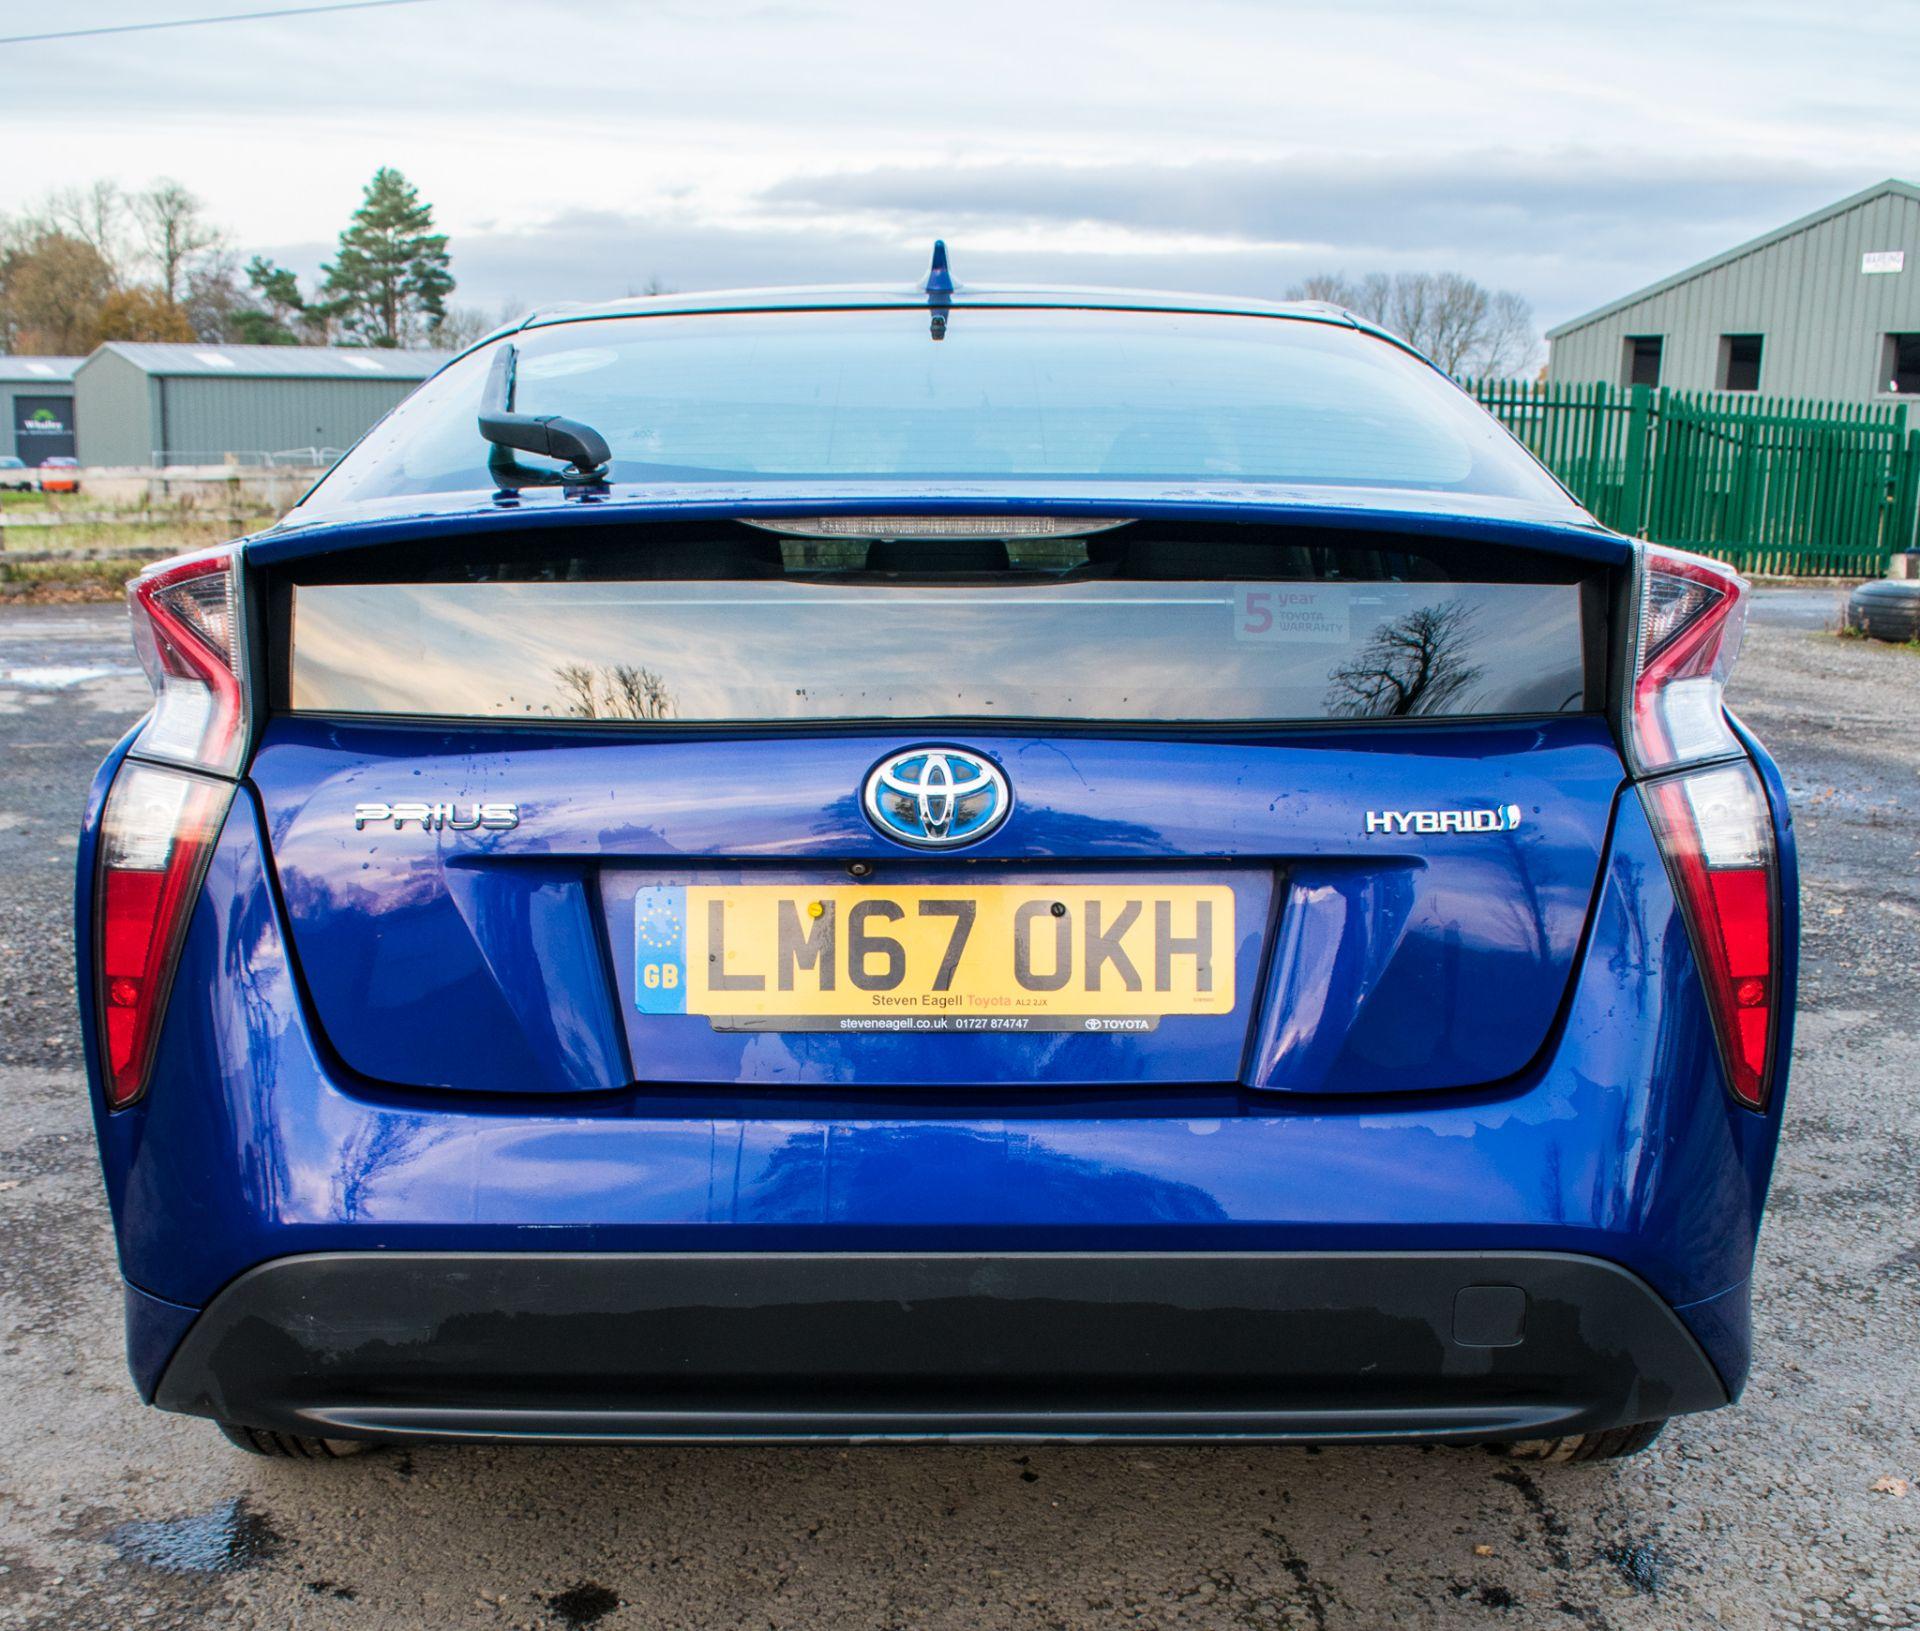 ToyotaPrius ActiveHybrid Electric 5 doorHatchback  Registration Number: LM67 OKH Date of First - Image 6 of 17